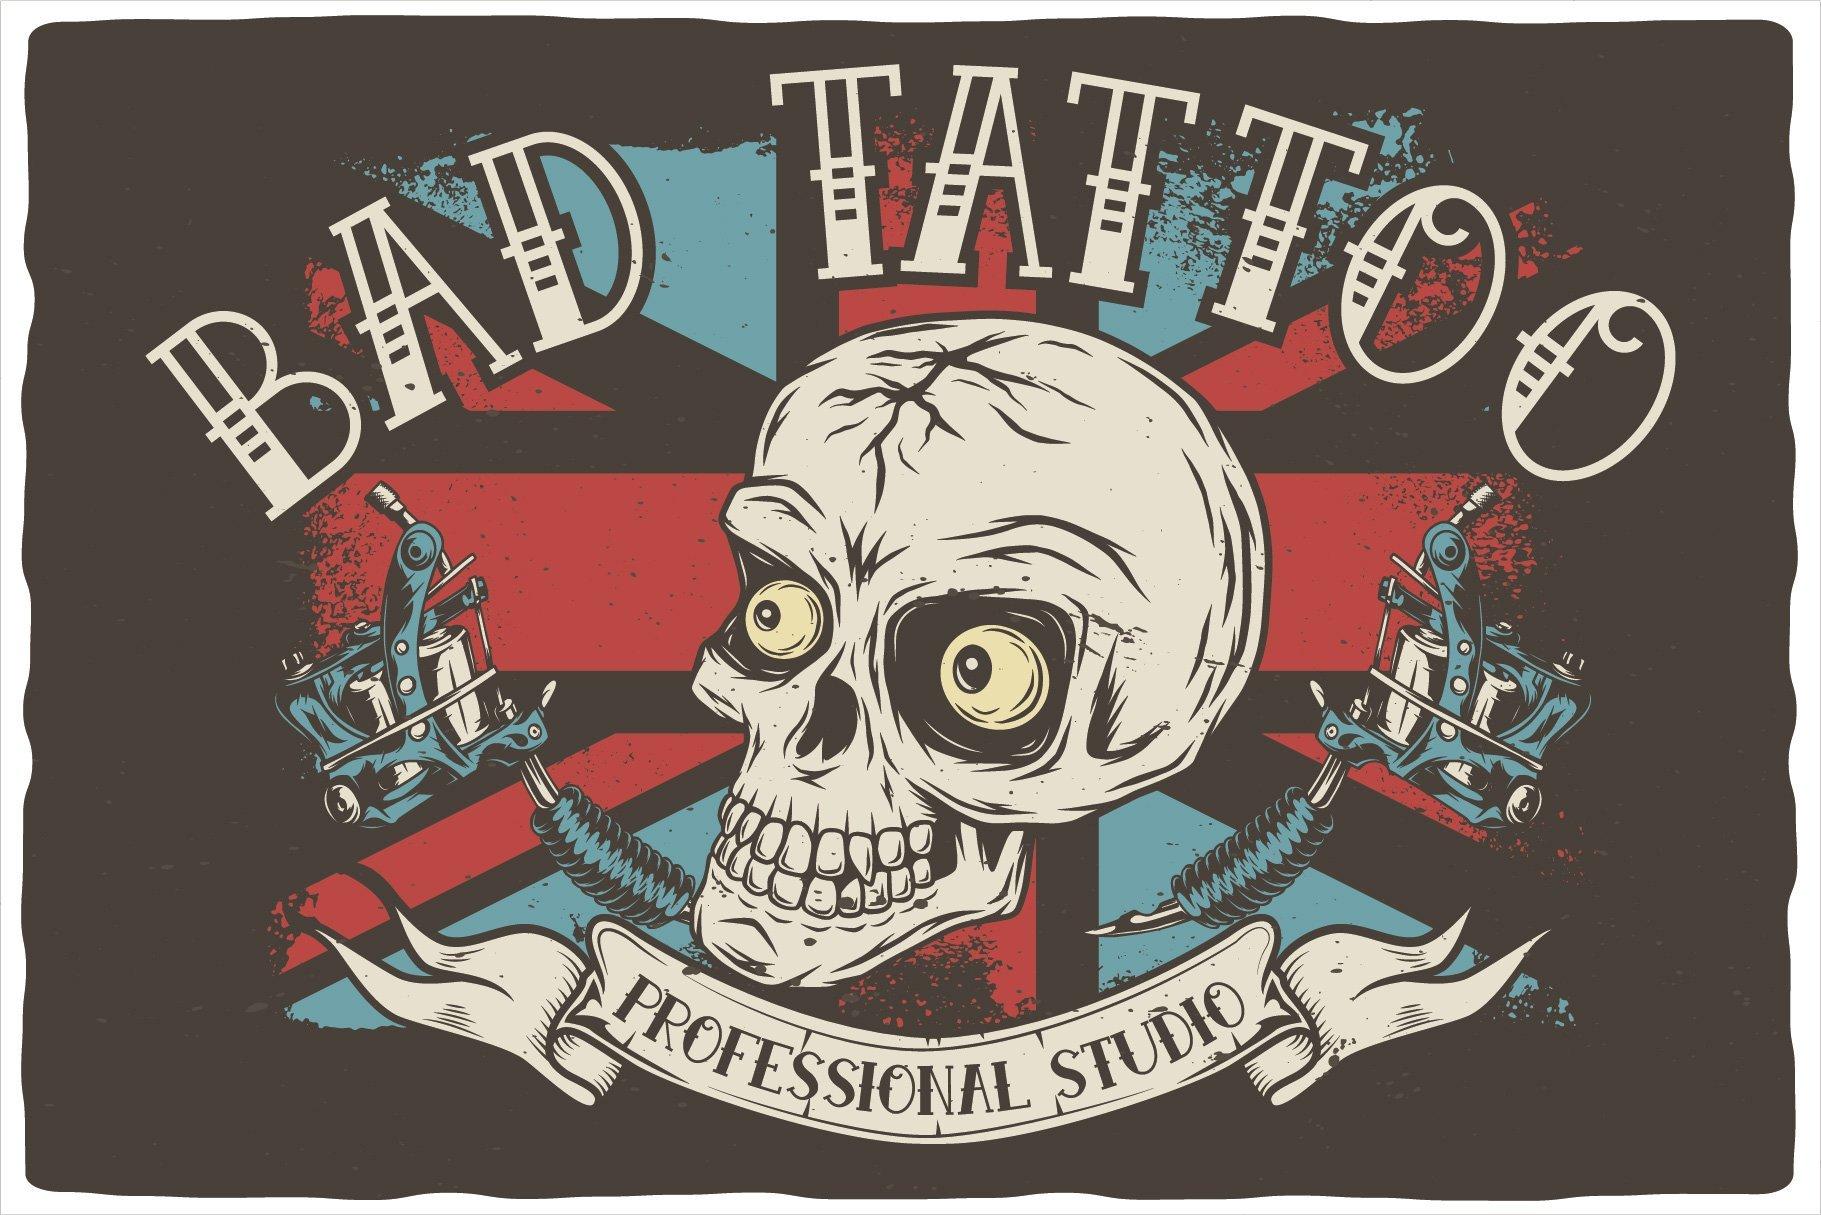 Bad tattoo professional studio by ink font.